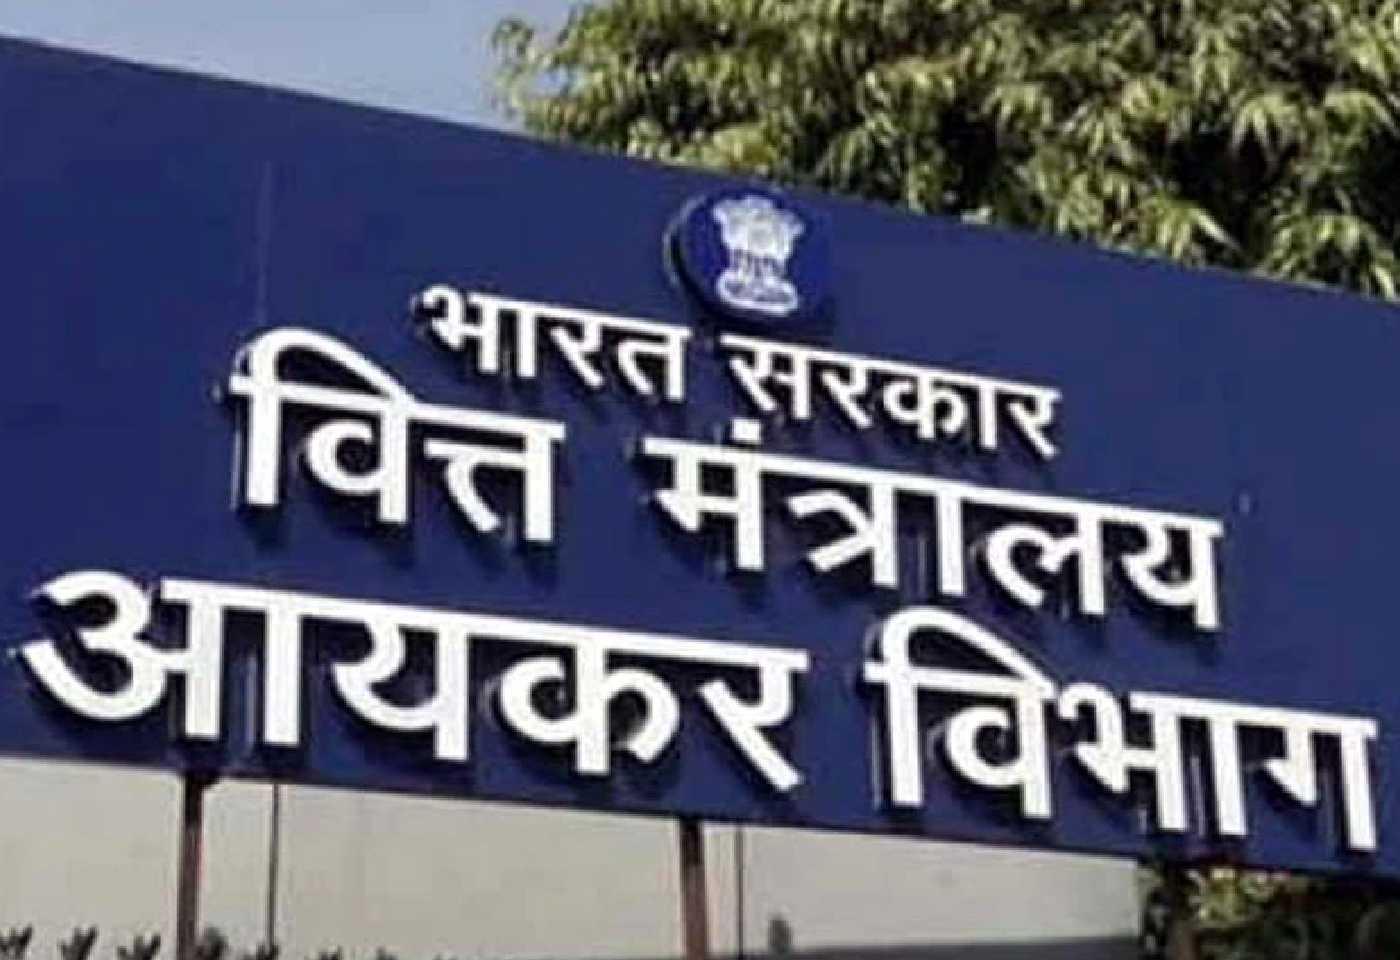 Income tax dept raids offices of Dainik Bhaskar Group at Noida jaipur and ahemadabad